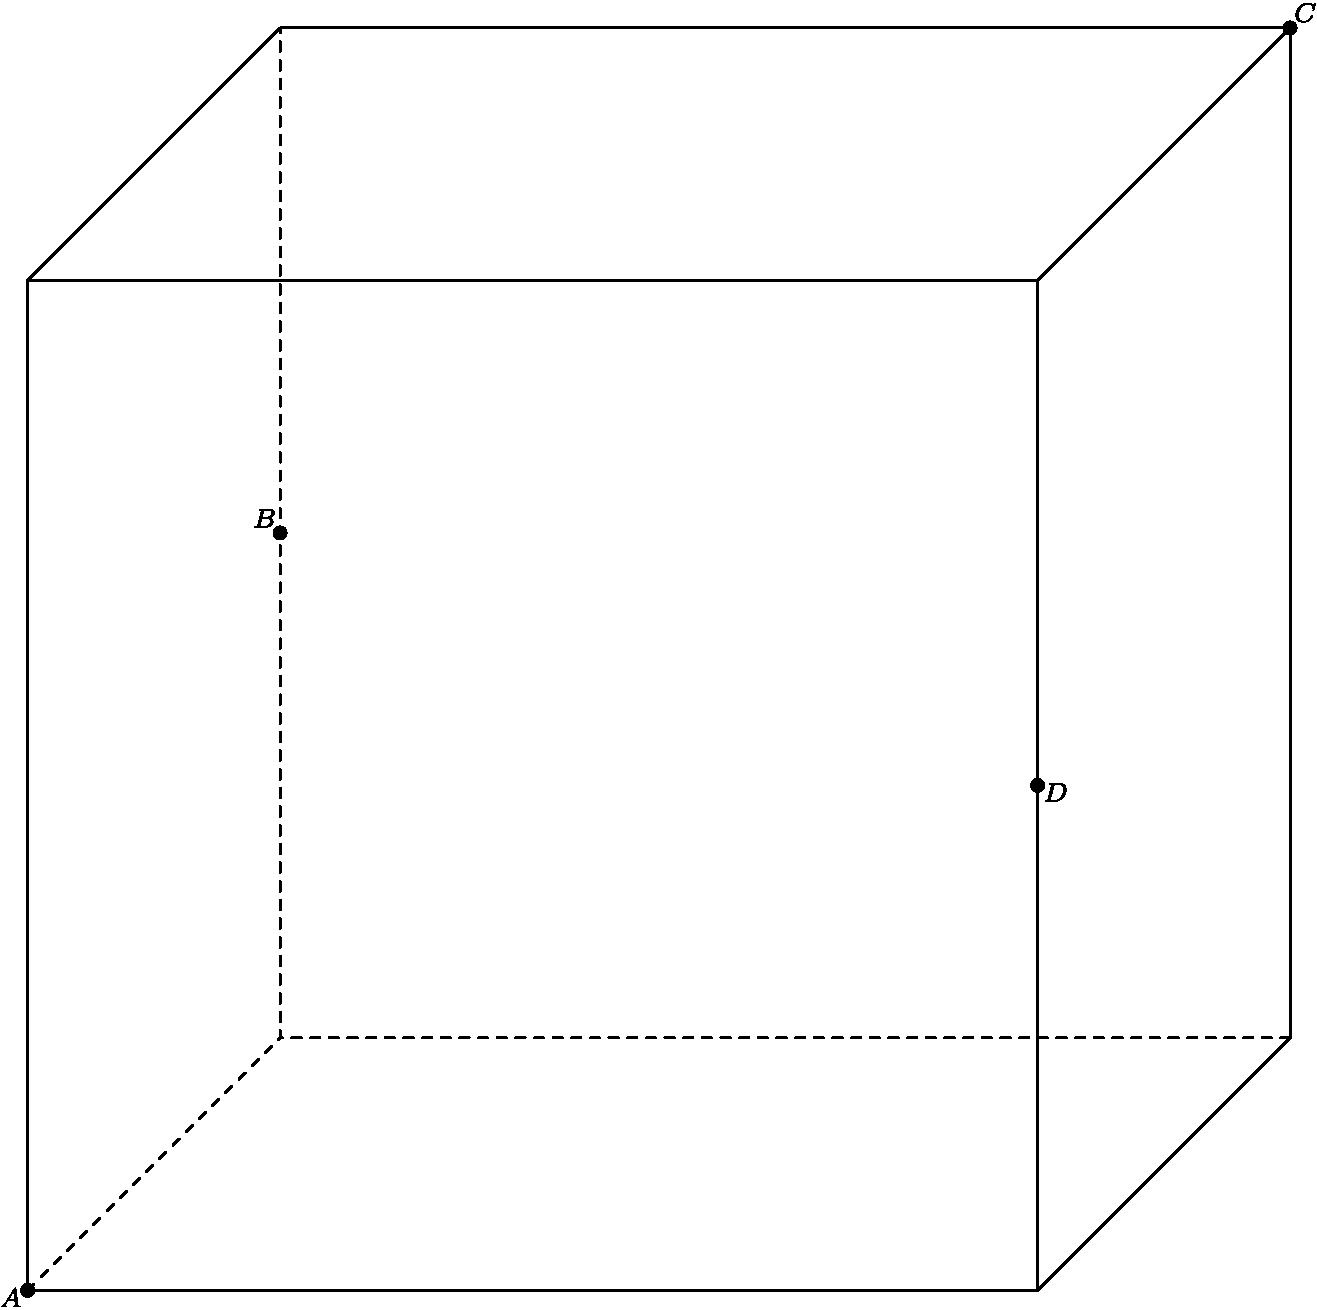 "[asy] import three; unitsize(3cm); defaultpen(fontsize(8)+linewidth(0.7)); currentprojection=obliqueX; draw((0.5,0,0)--(0,0,0)--(0,0,1)--(0,0,0)--(0,1,0),linetype(""4 4"")); draw((0.5,0,1)--(0,0,1)--(0,1,1)--(0.5,1,1)--(0.5,0,1)--(0.5,0,0)--(0.5,1,0)--(0.5,1,1)); draw((0.5,1,0)--(0,1,0)--(0,1,1)); dot((0.5,0,0)); label(""$A$"",(0.5,0,0),WSW); dot((0,1,1)); label(""$C$"",(0,1,1),NE); dot((0.5,1,0.5)); label(""$D$"",(0.5,1,0.5),ESE); dot((0,0,0.5)); label(""$B$"",(0,0,0.5),NW);[/asy]"